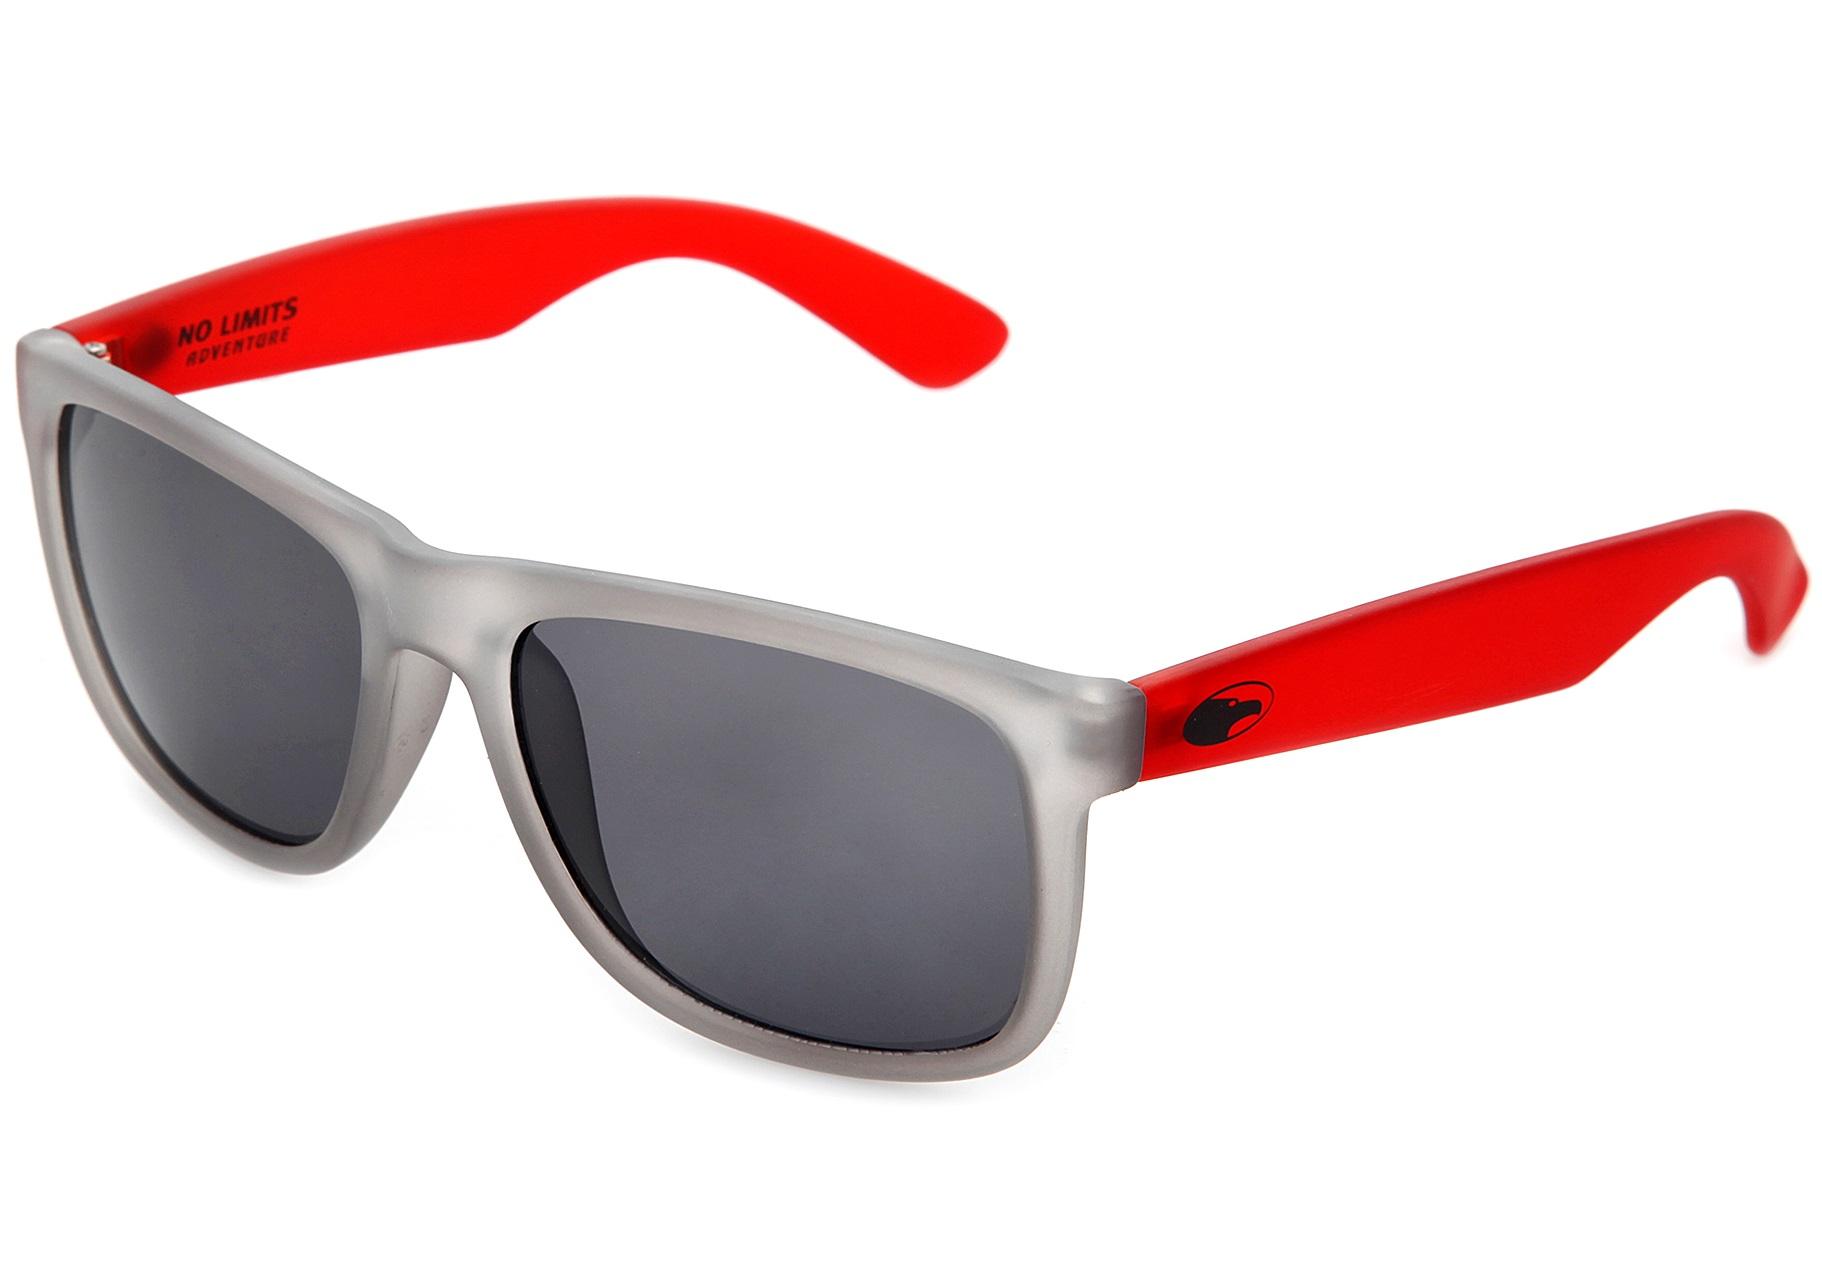 Sunglasses No Limits Wave 02 Rf600315